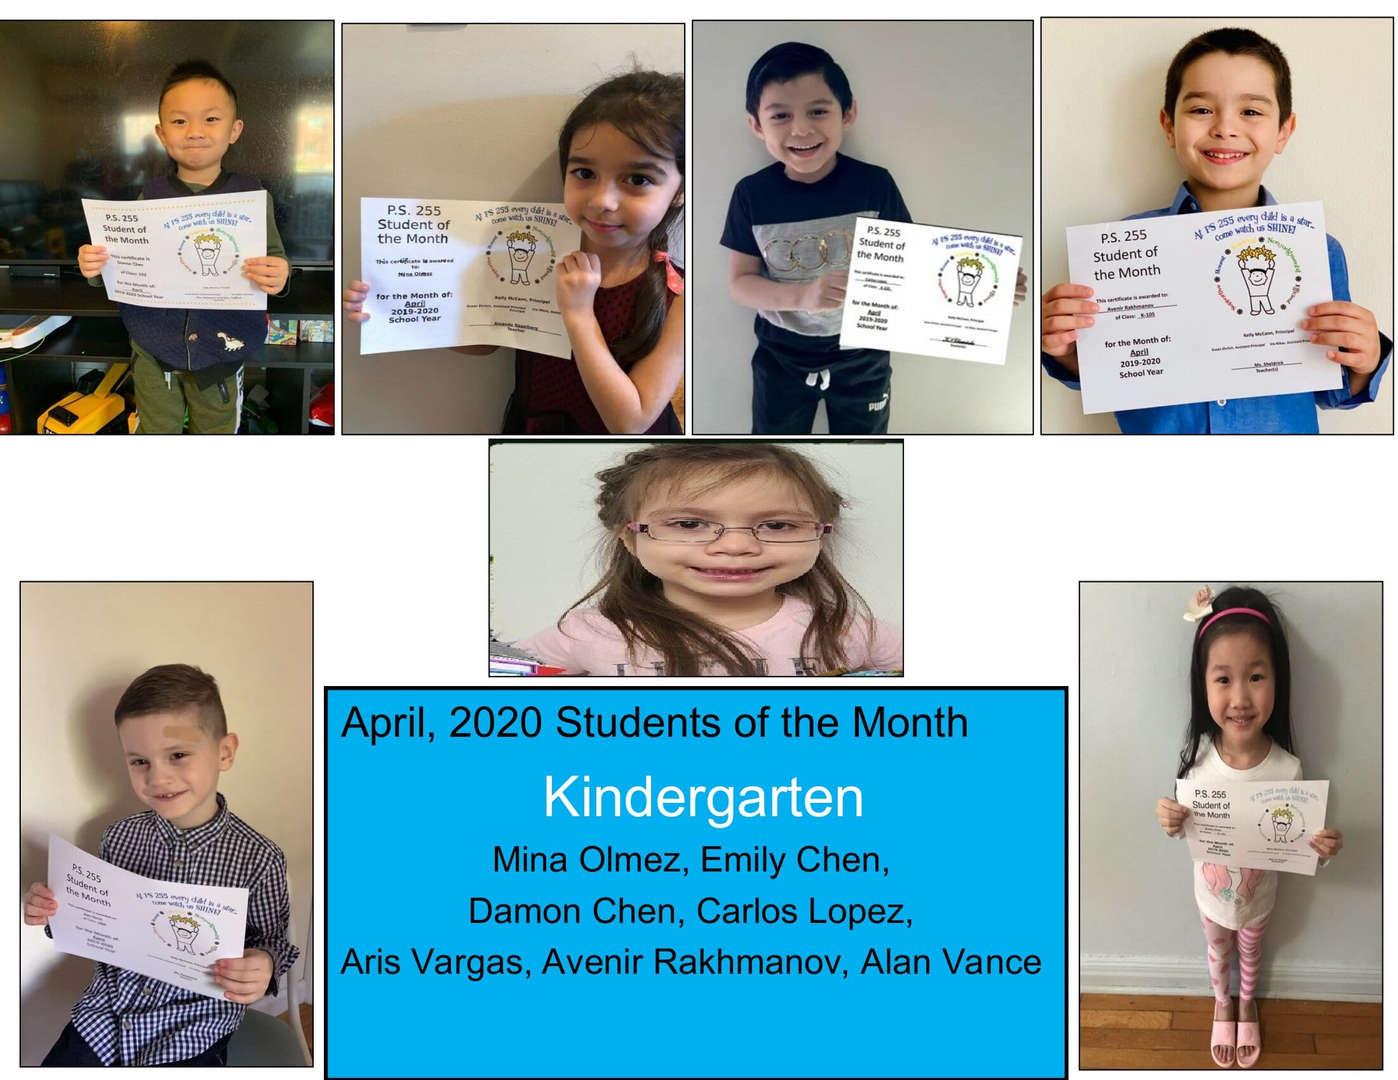 April Student of the Month Kindergarten